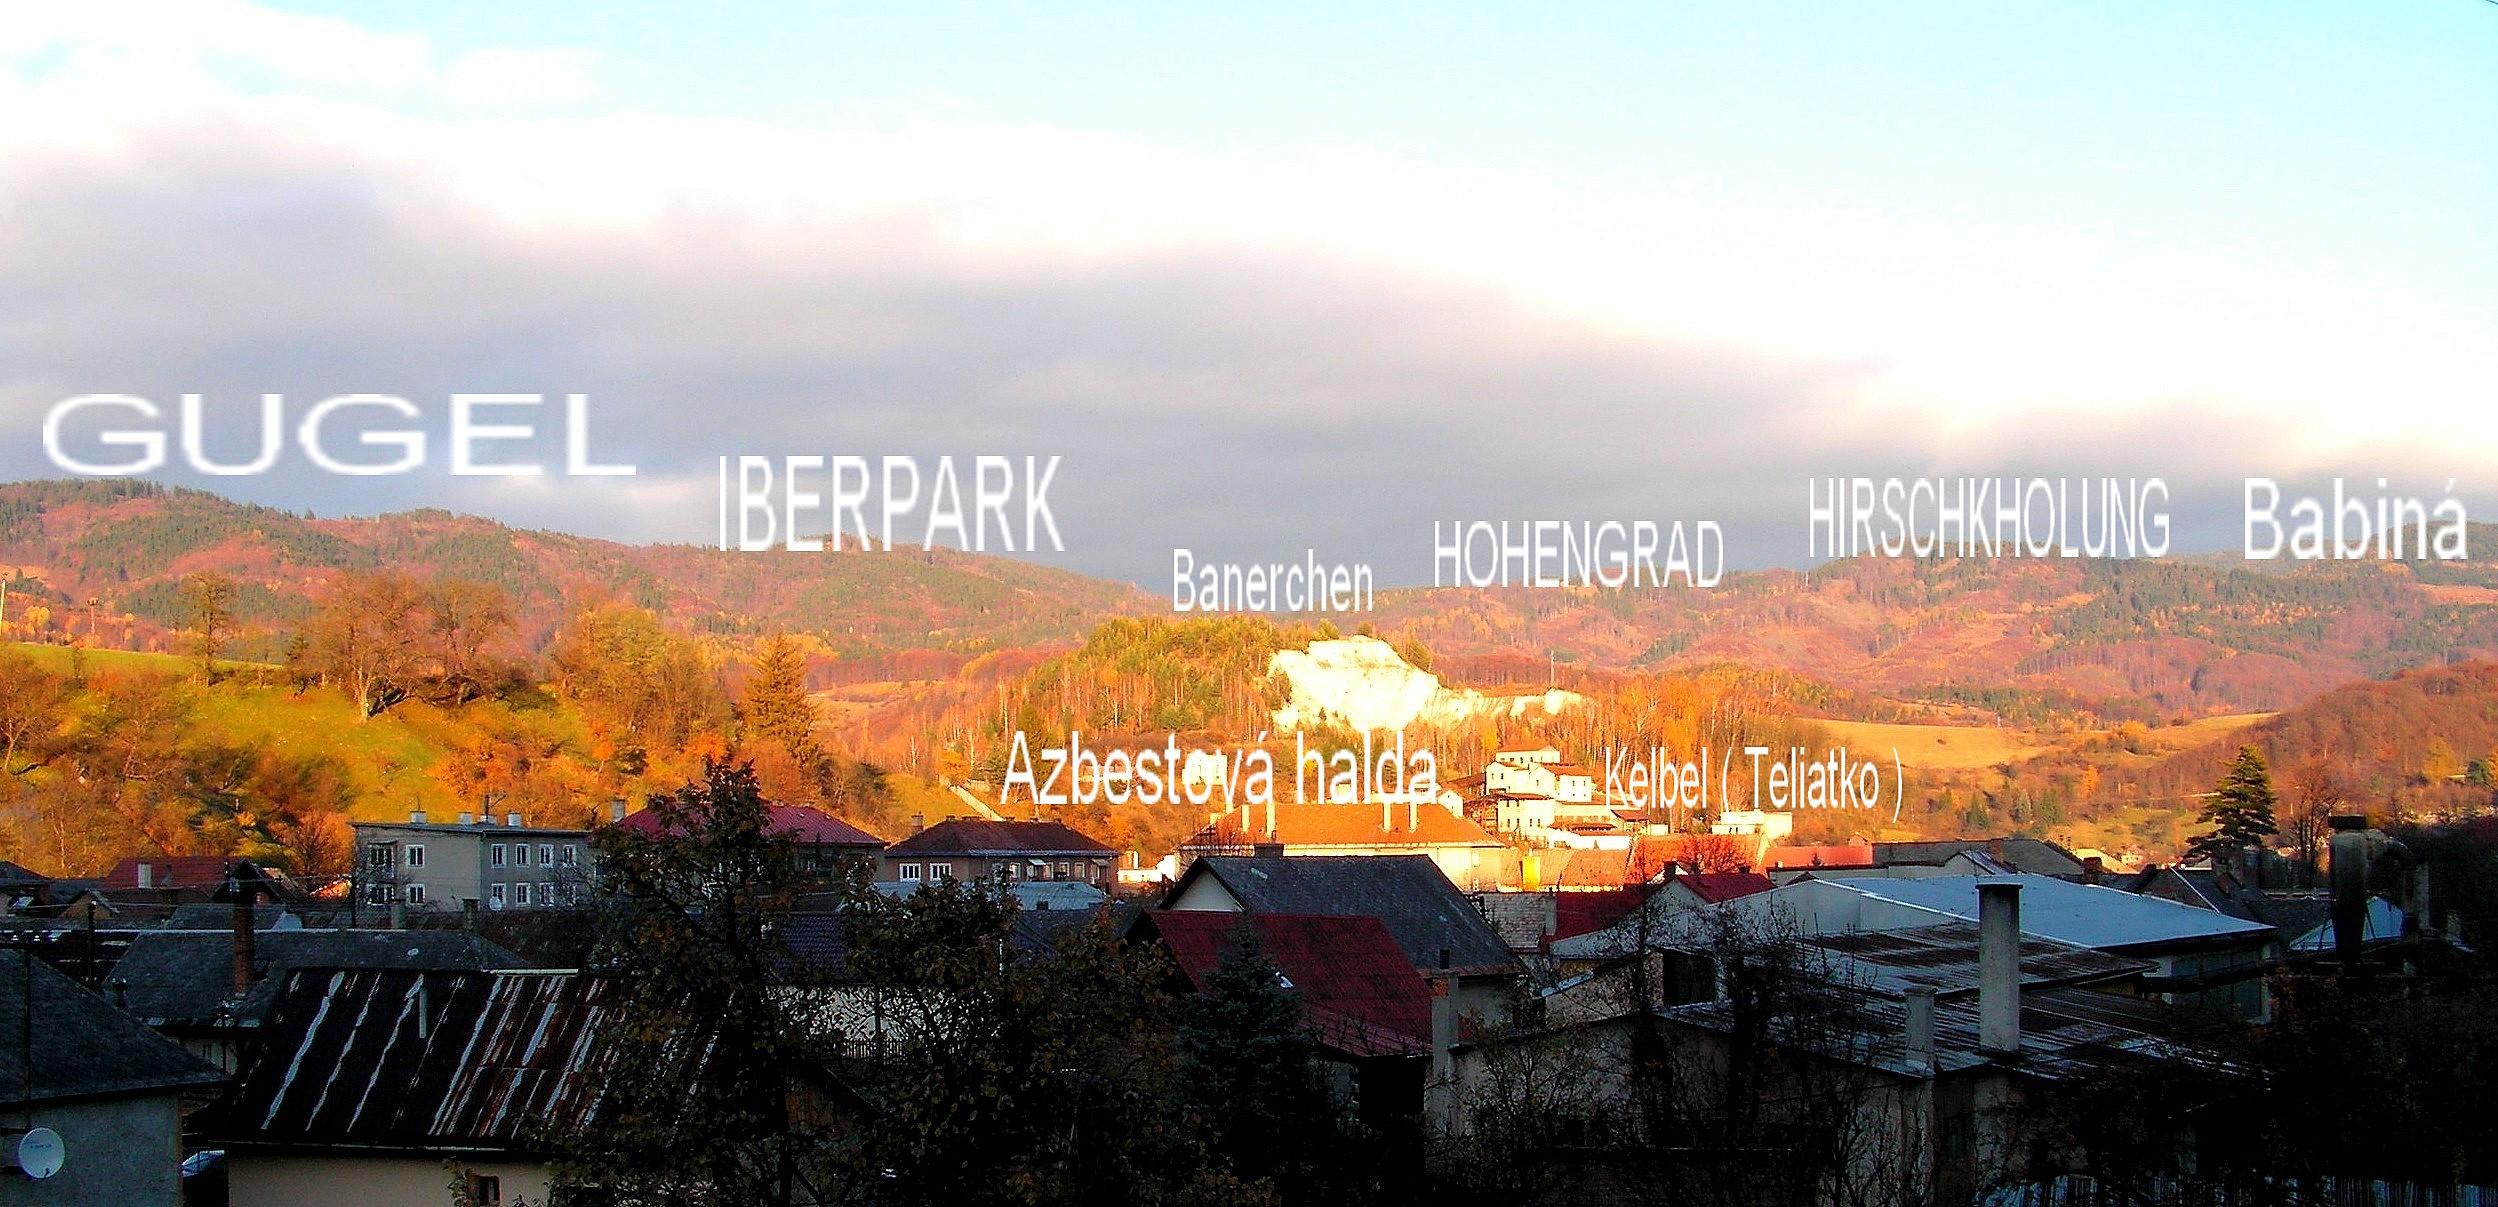 Gugel, Iberpark,Hohengrad,Hirschkholung, Azbest Kelbel